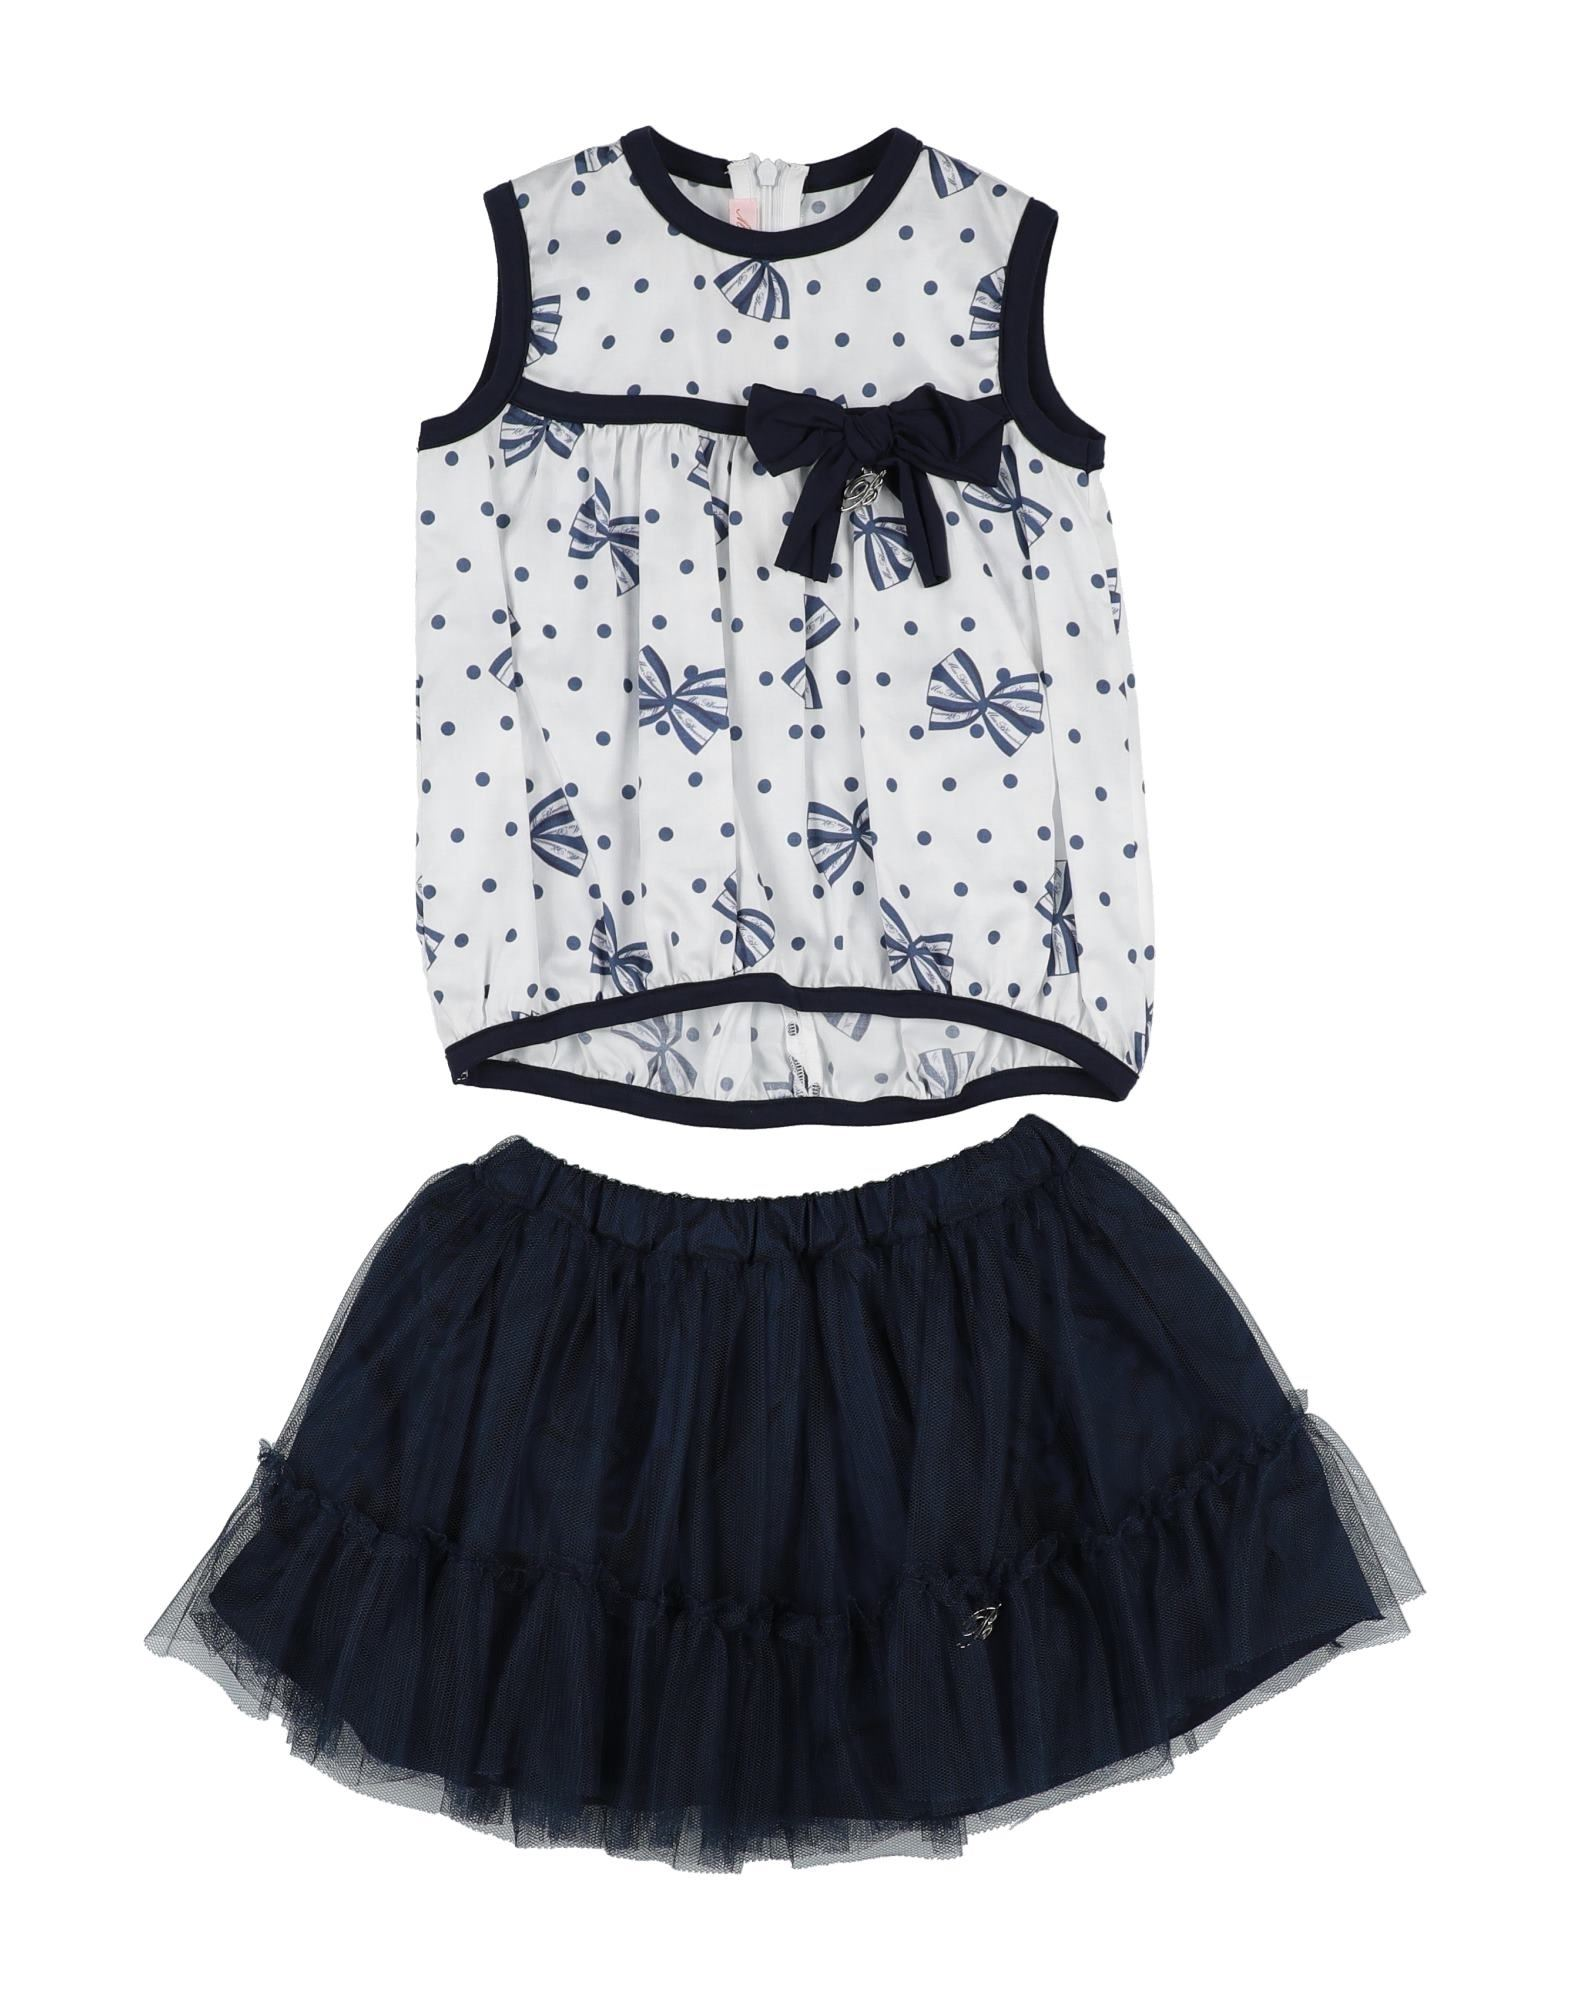 MISS BLUMARINE Skirt sets - Item 40126594